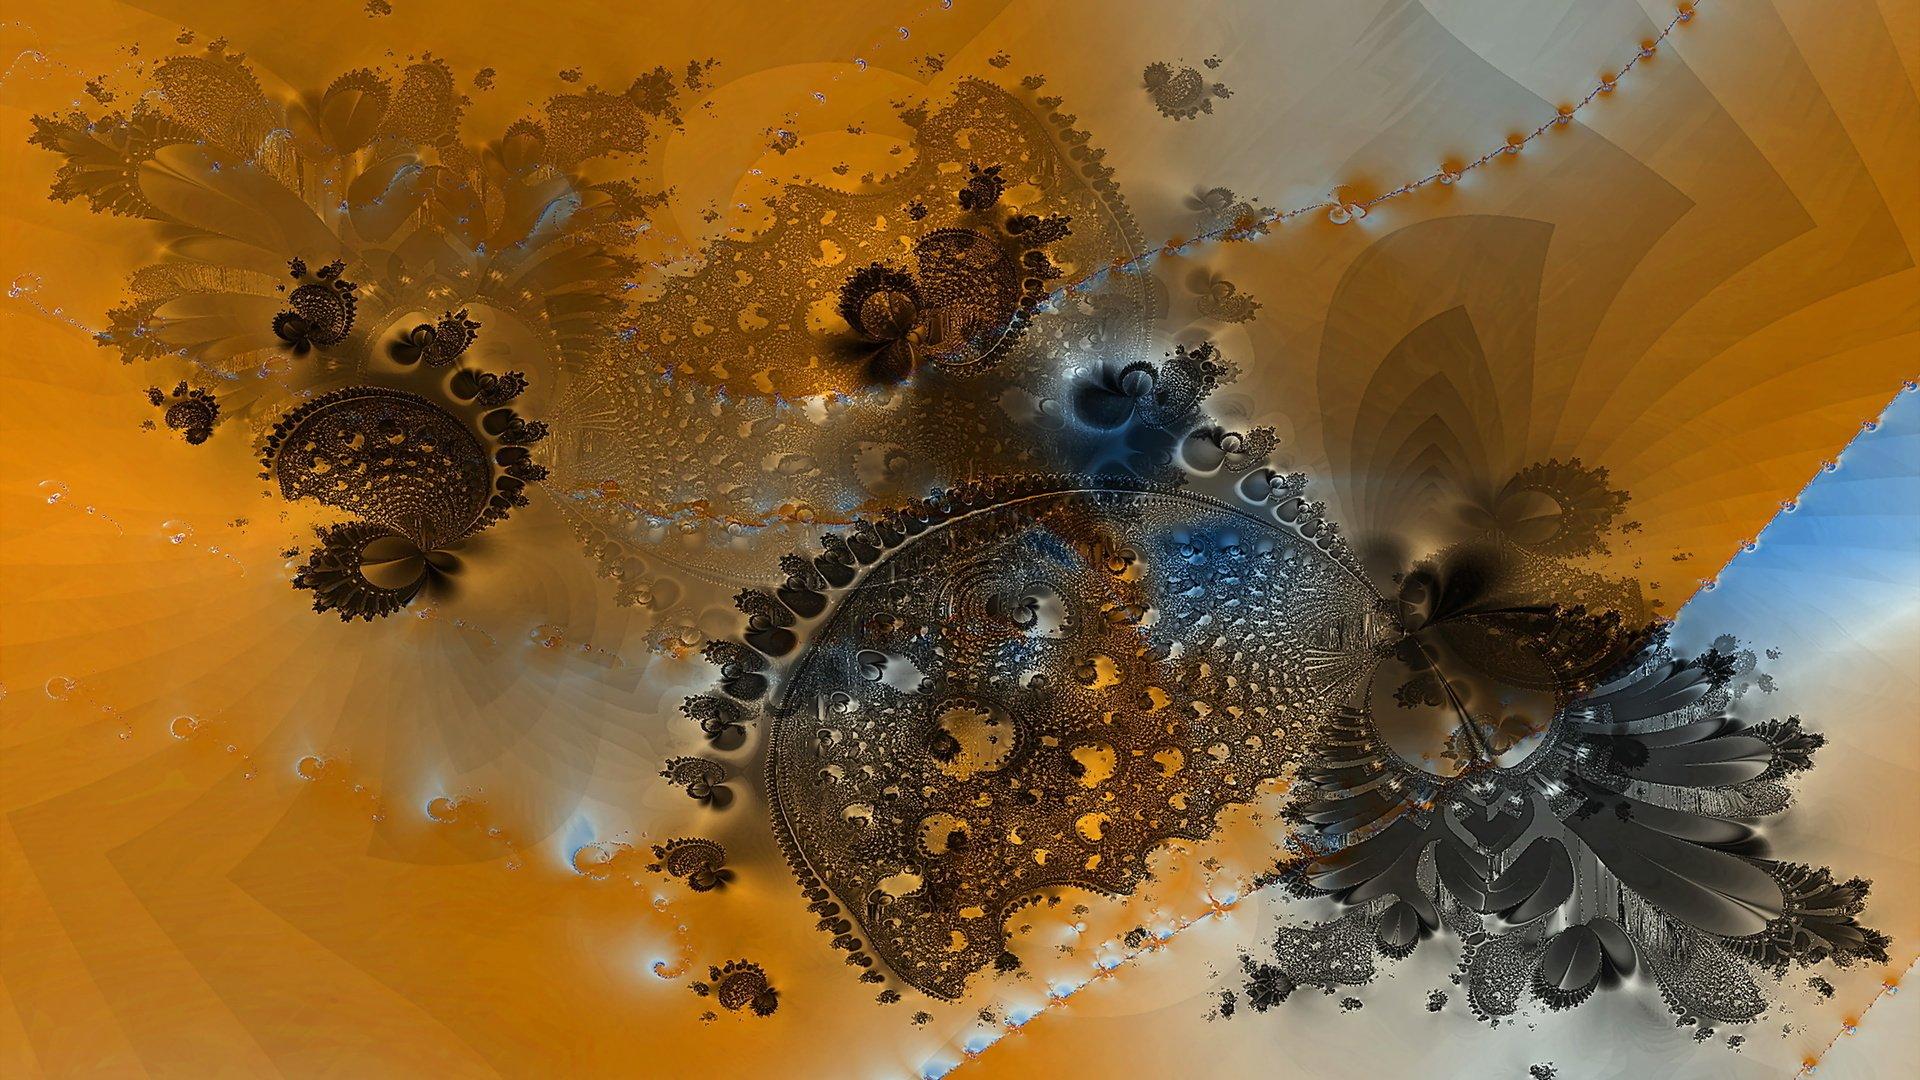 Обои Fractal, абстракция, форма, Цвет. Абстракции foto 11